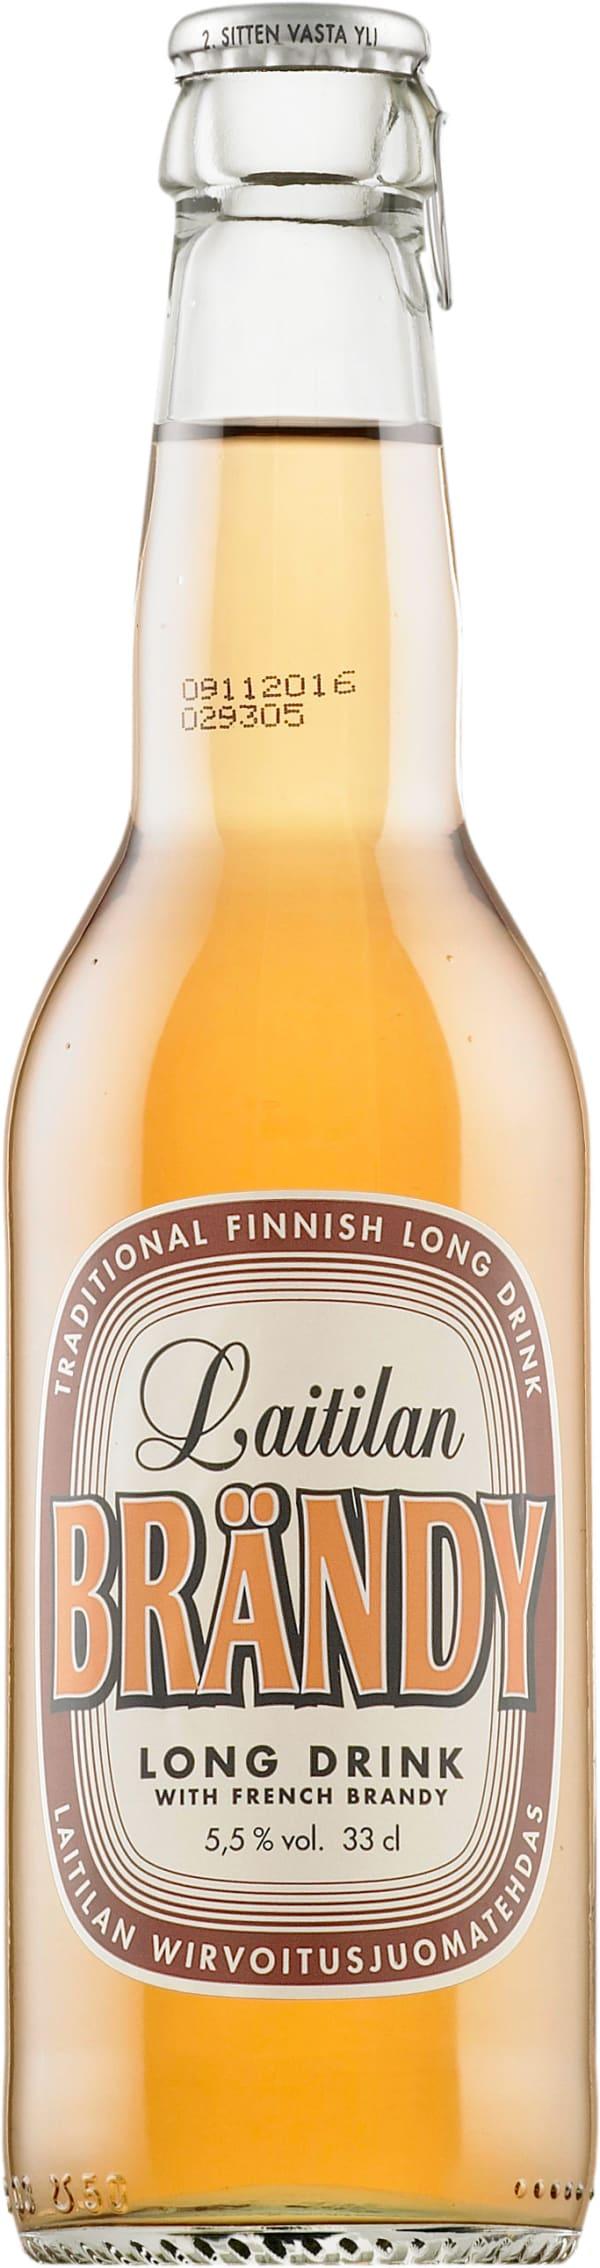 Laitilan Brändy Long Drink